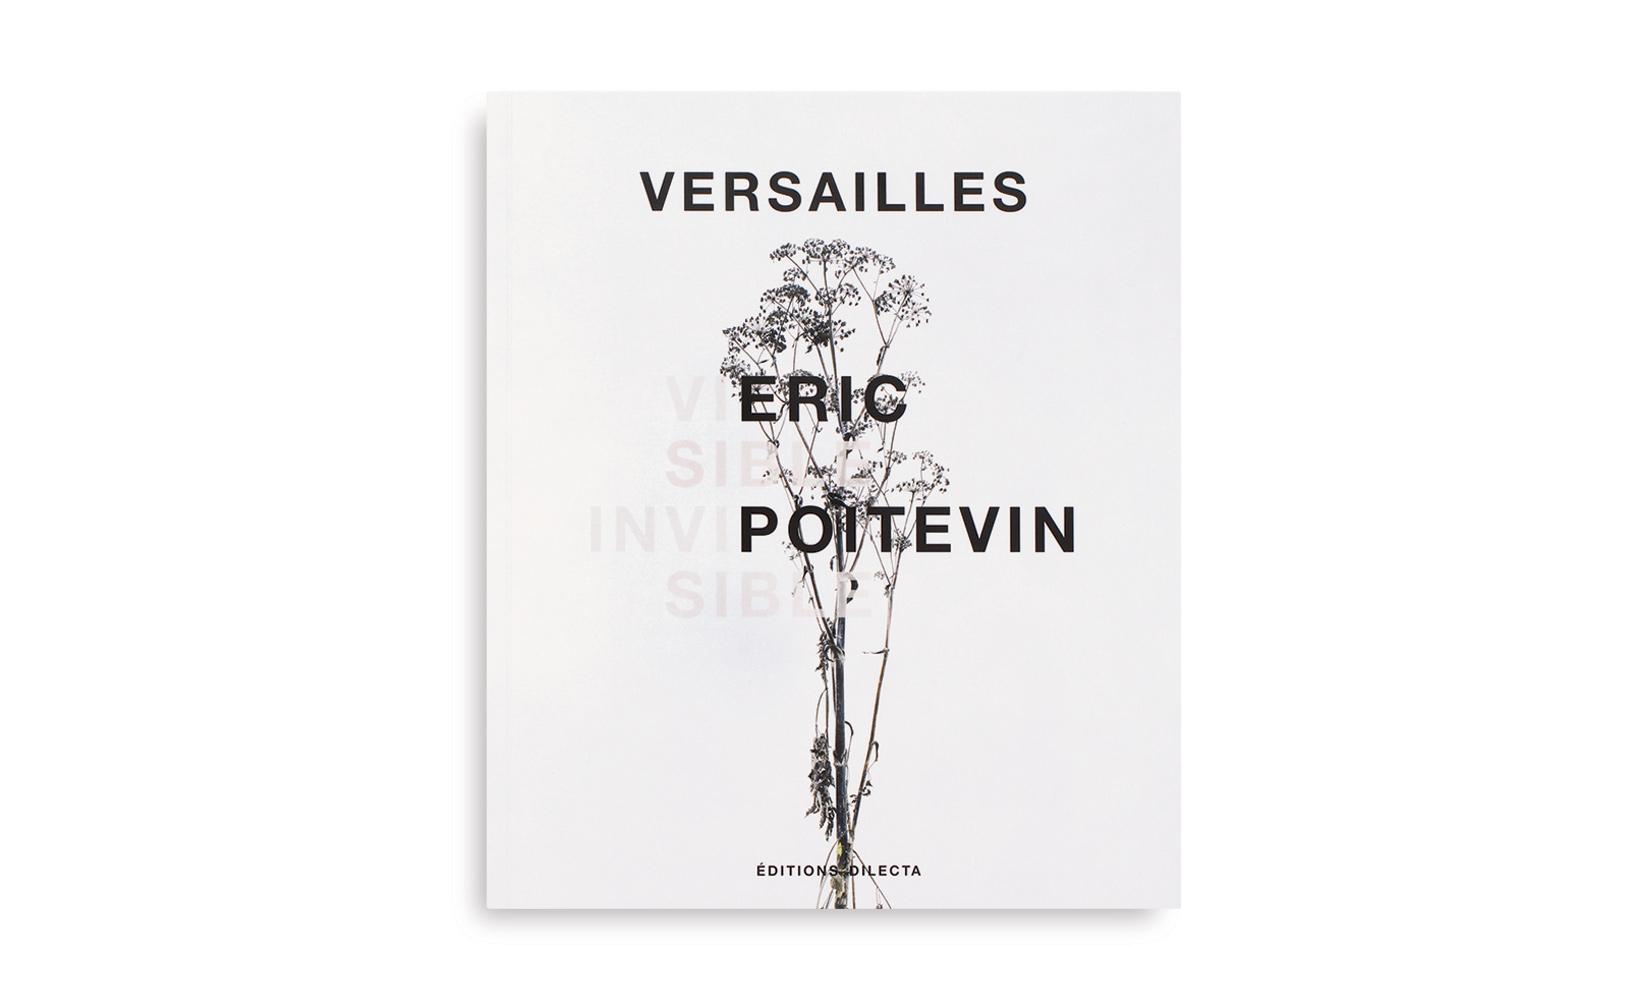 versailles-visible-invisible-toluca-studio-olivier-andreotti-POITEVIN-1.jpg